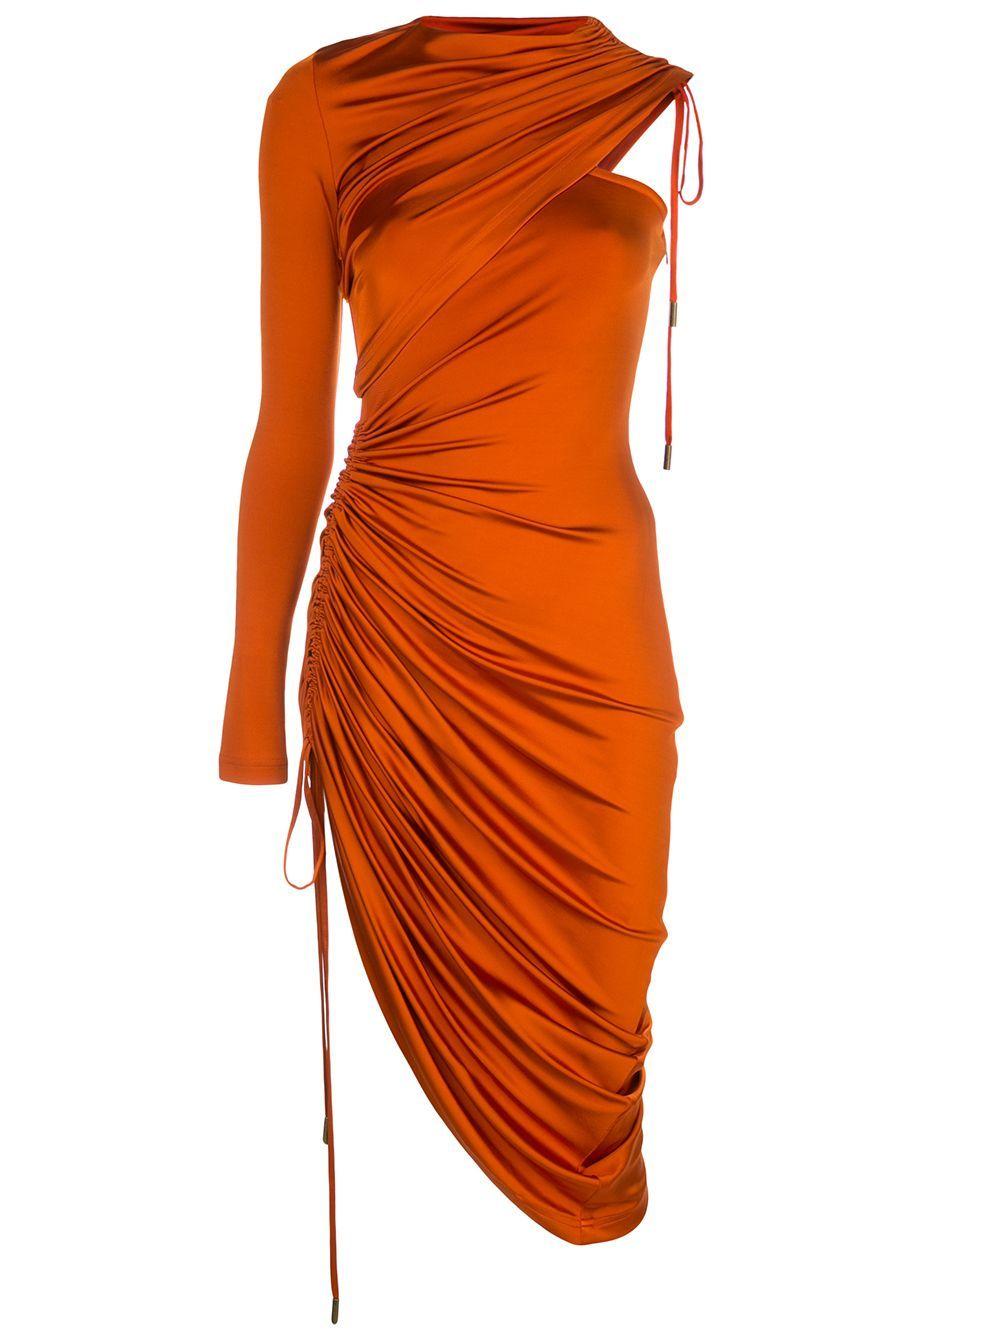 Satin single sleeve cocktail dress